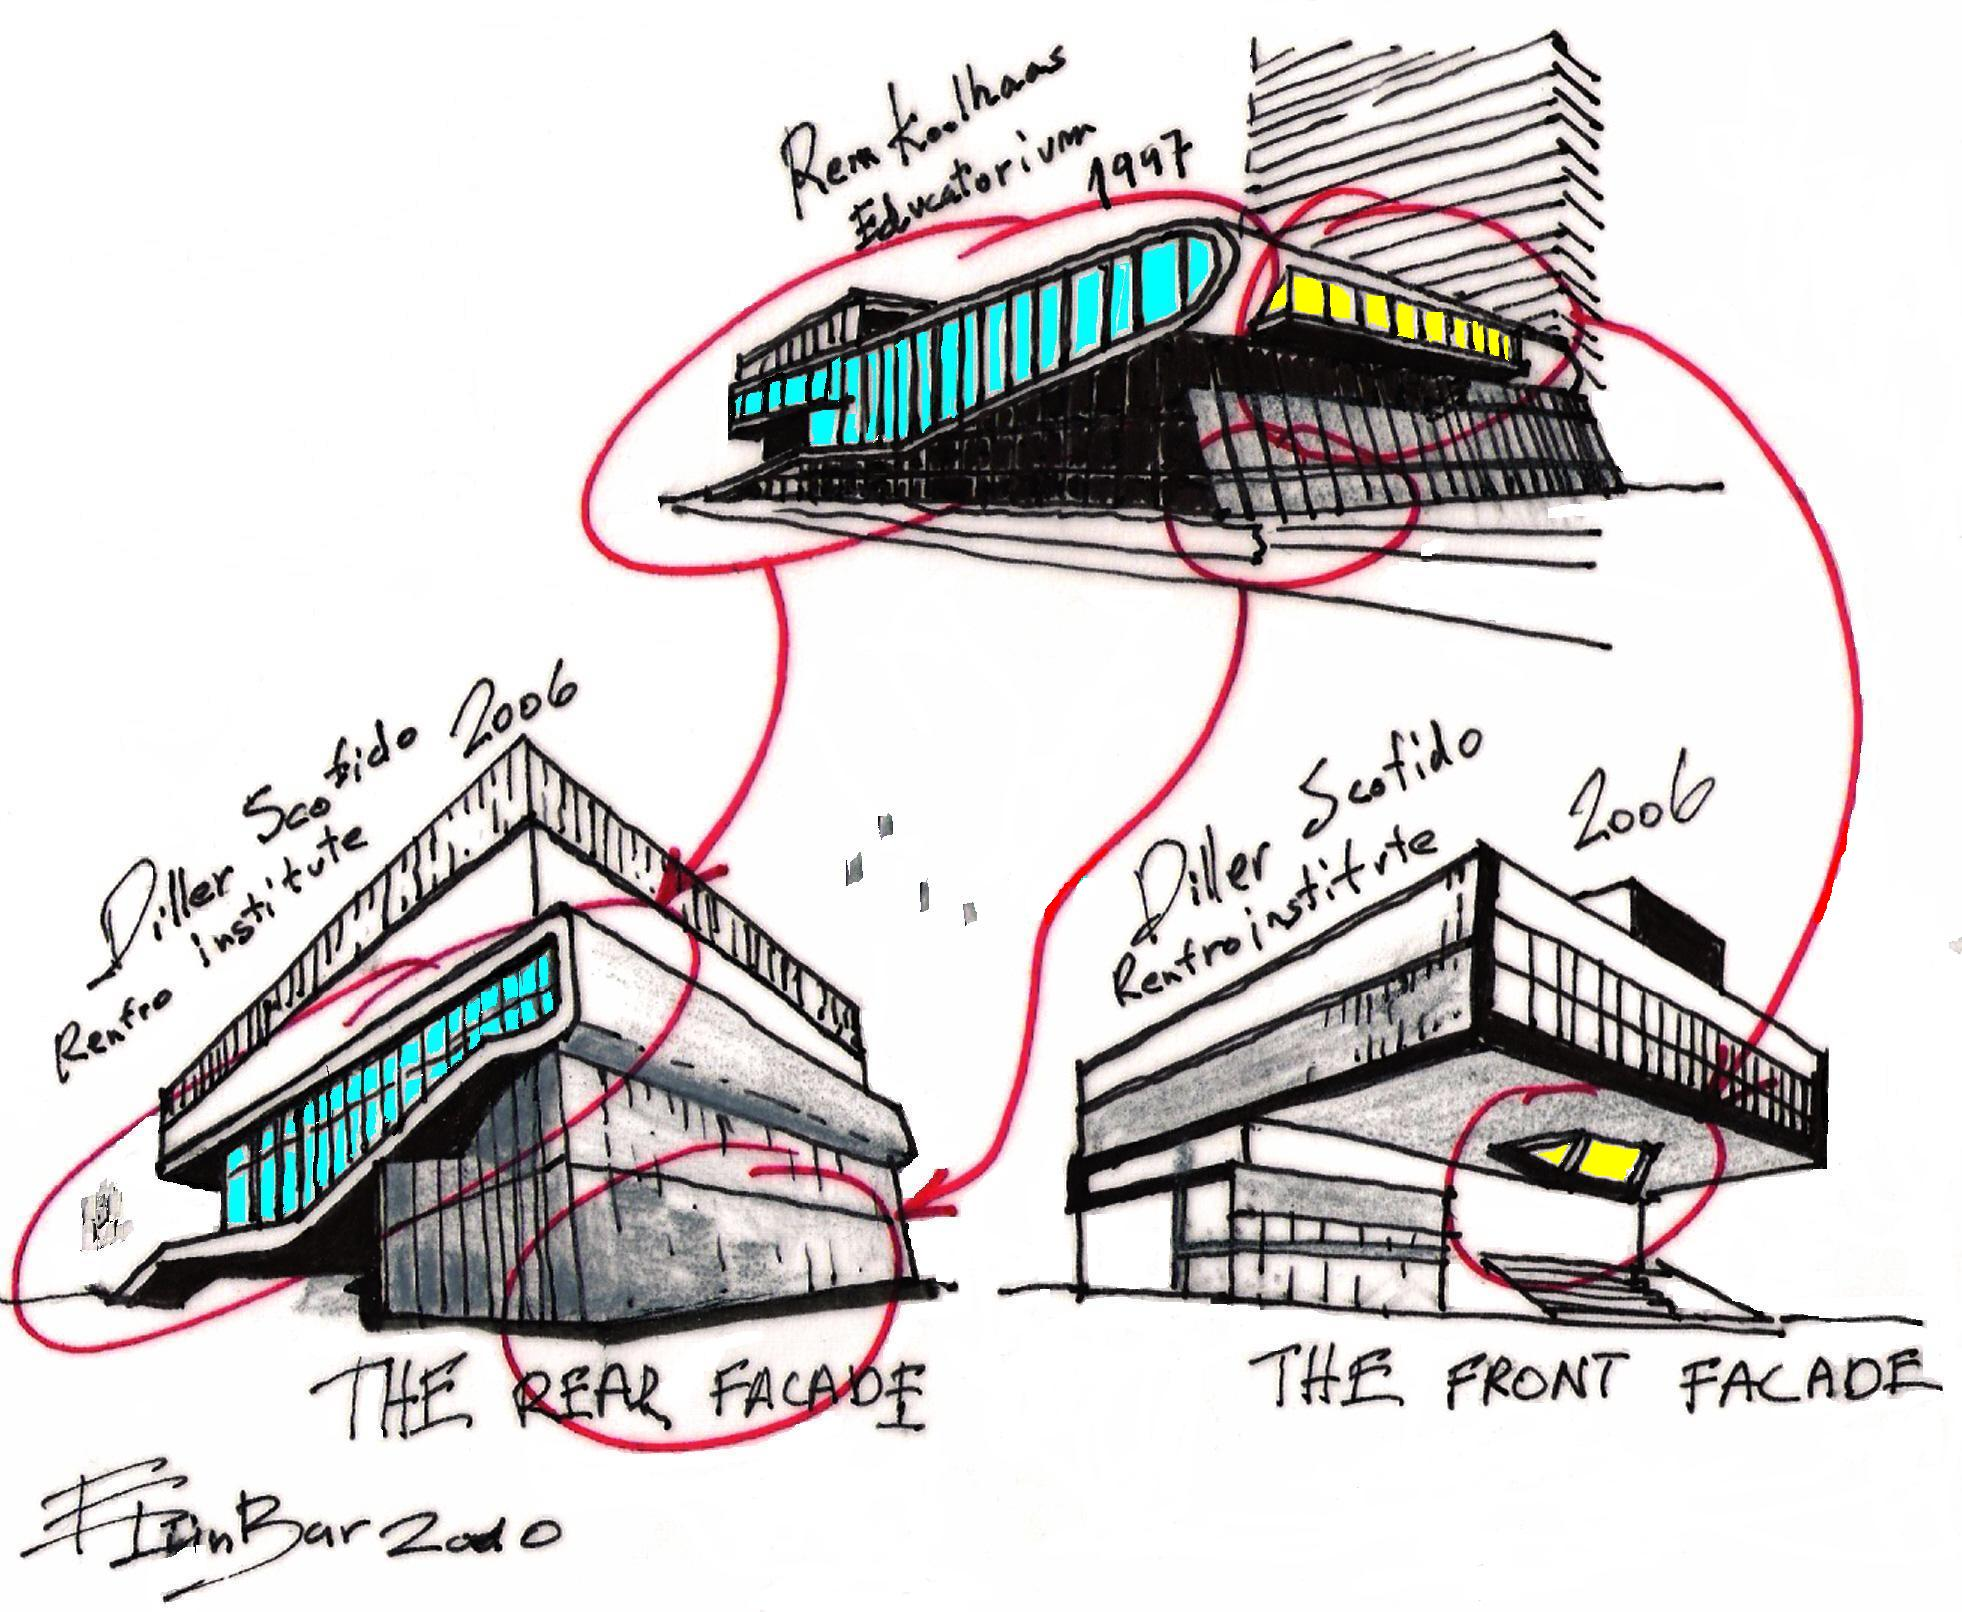 39 maison bordeaux rem koolhaas plan and elevations. Black Bedroom Furniture Sets. Home Design Ideas